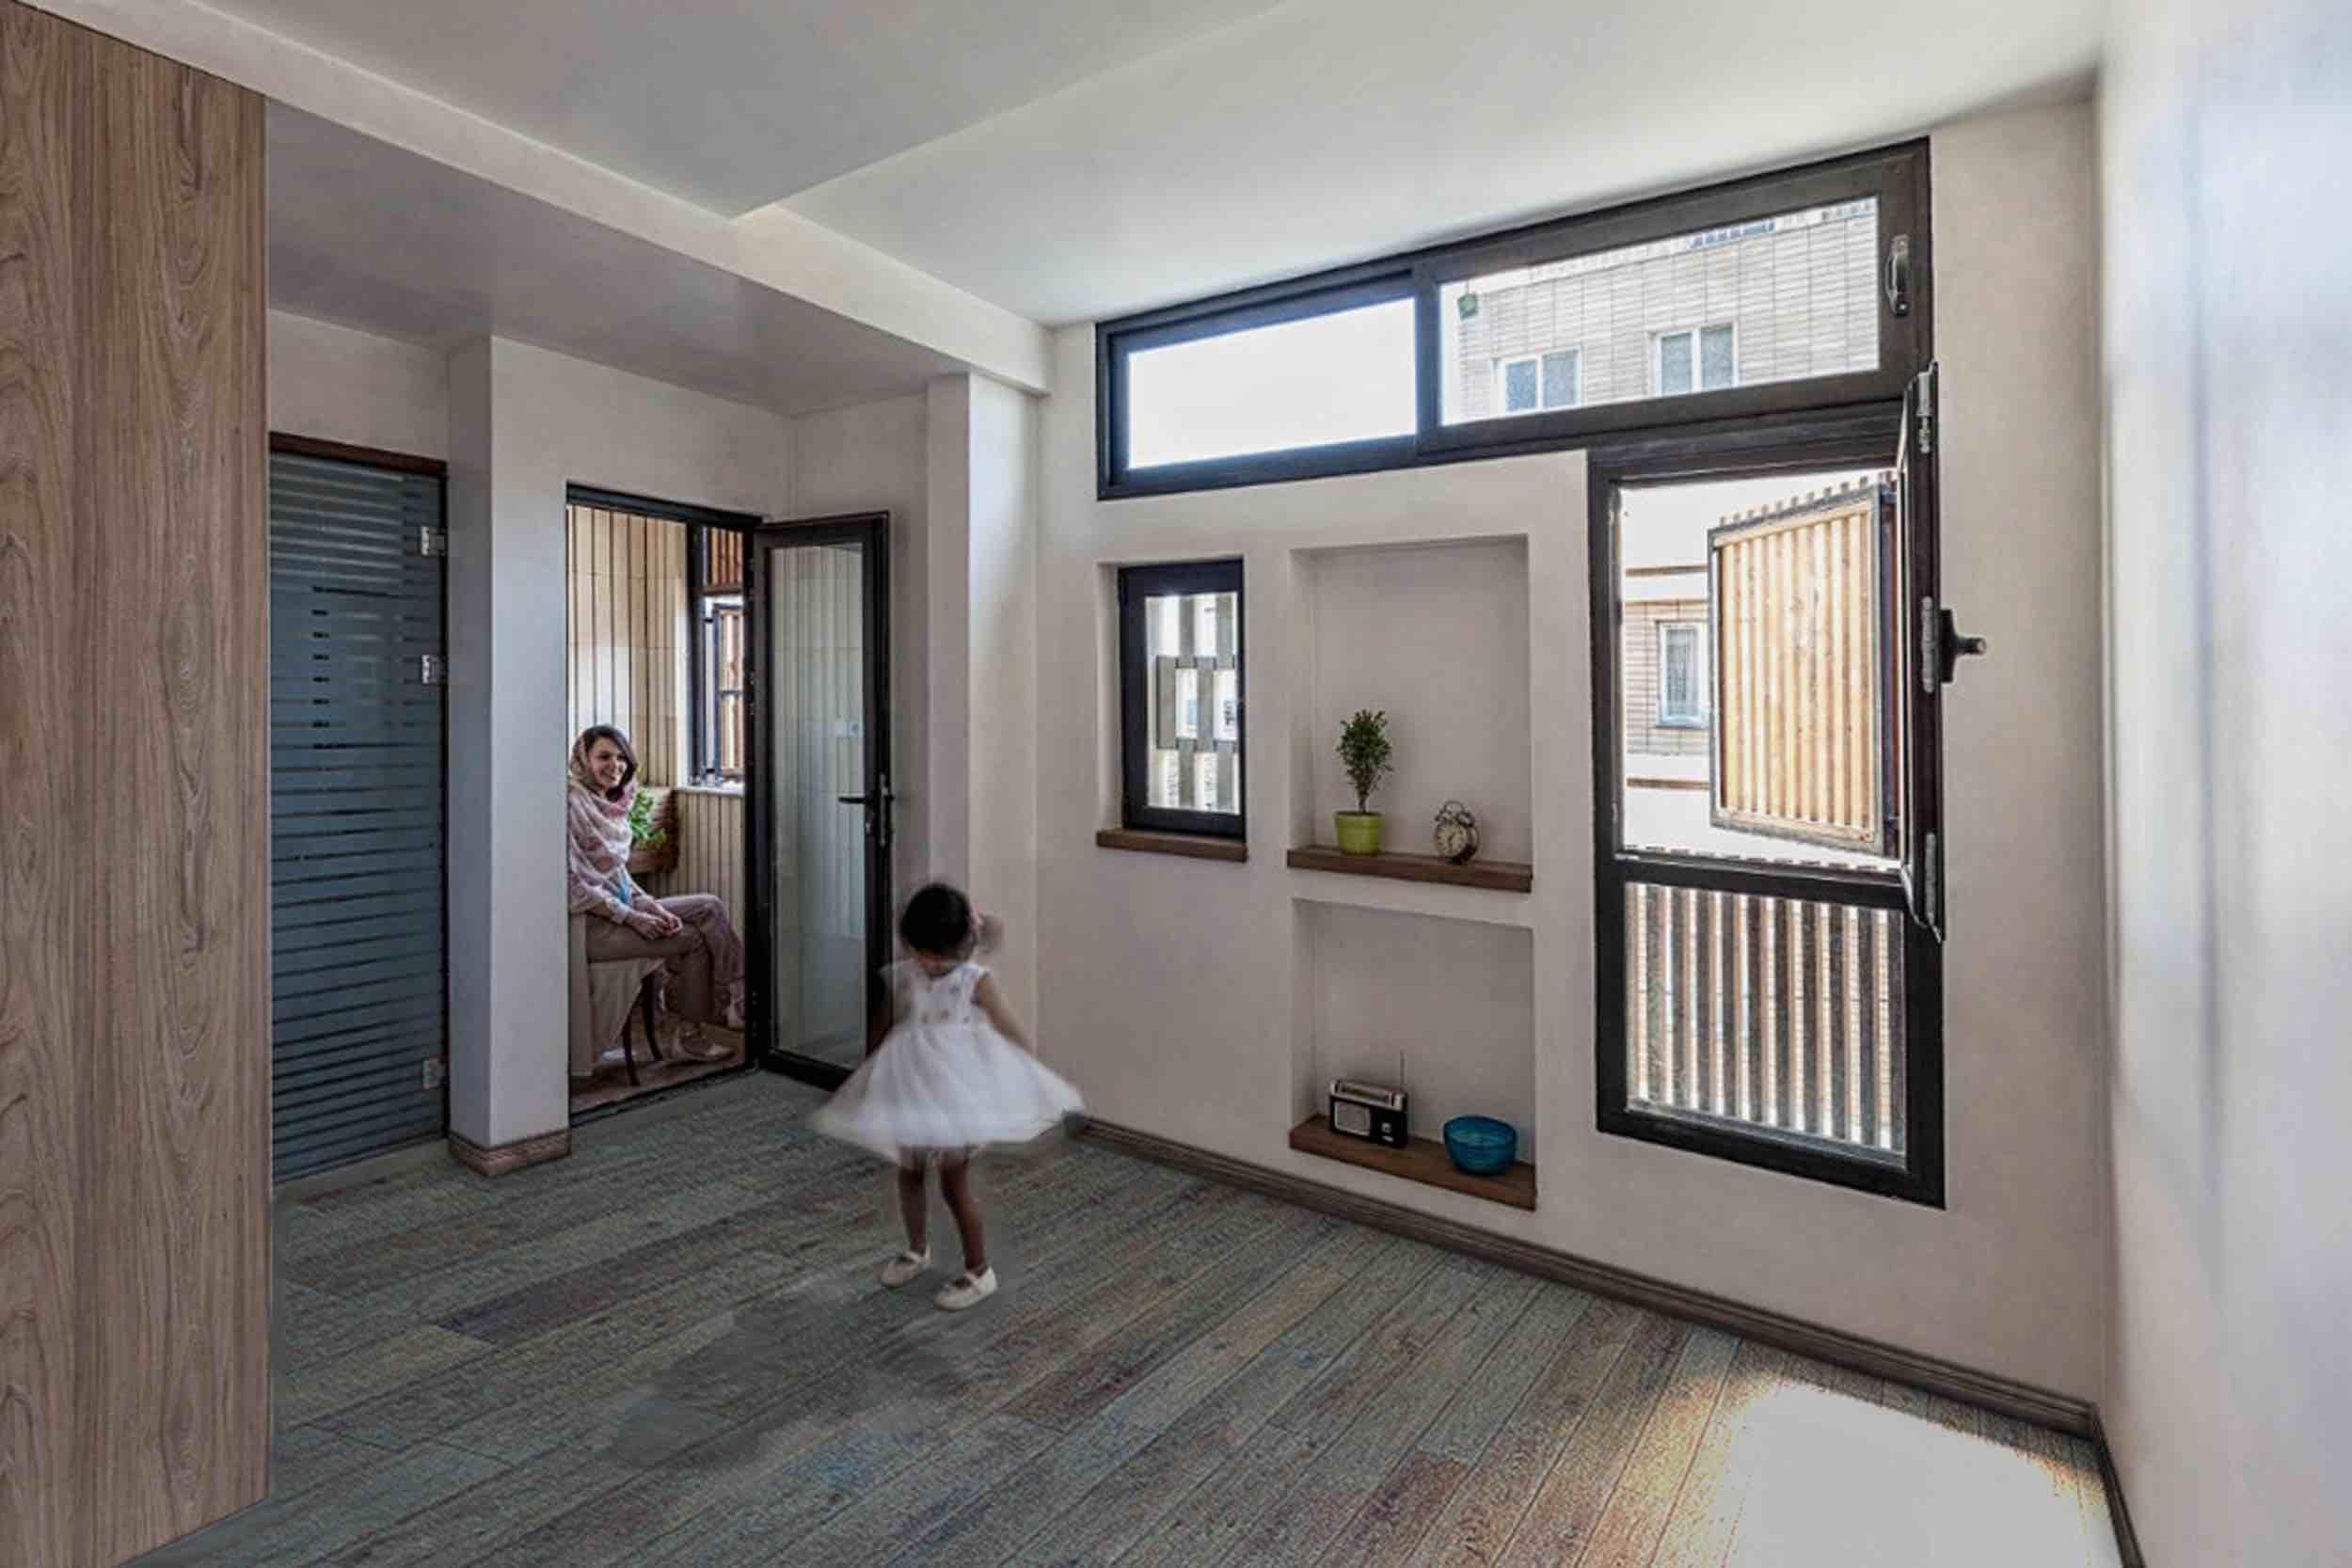 Rouzan_Residential_Building_Sayed_hamed_jafari_Charchoob_Architecture_Office_009.jpg